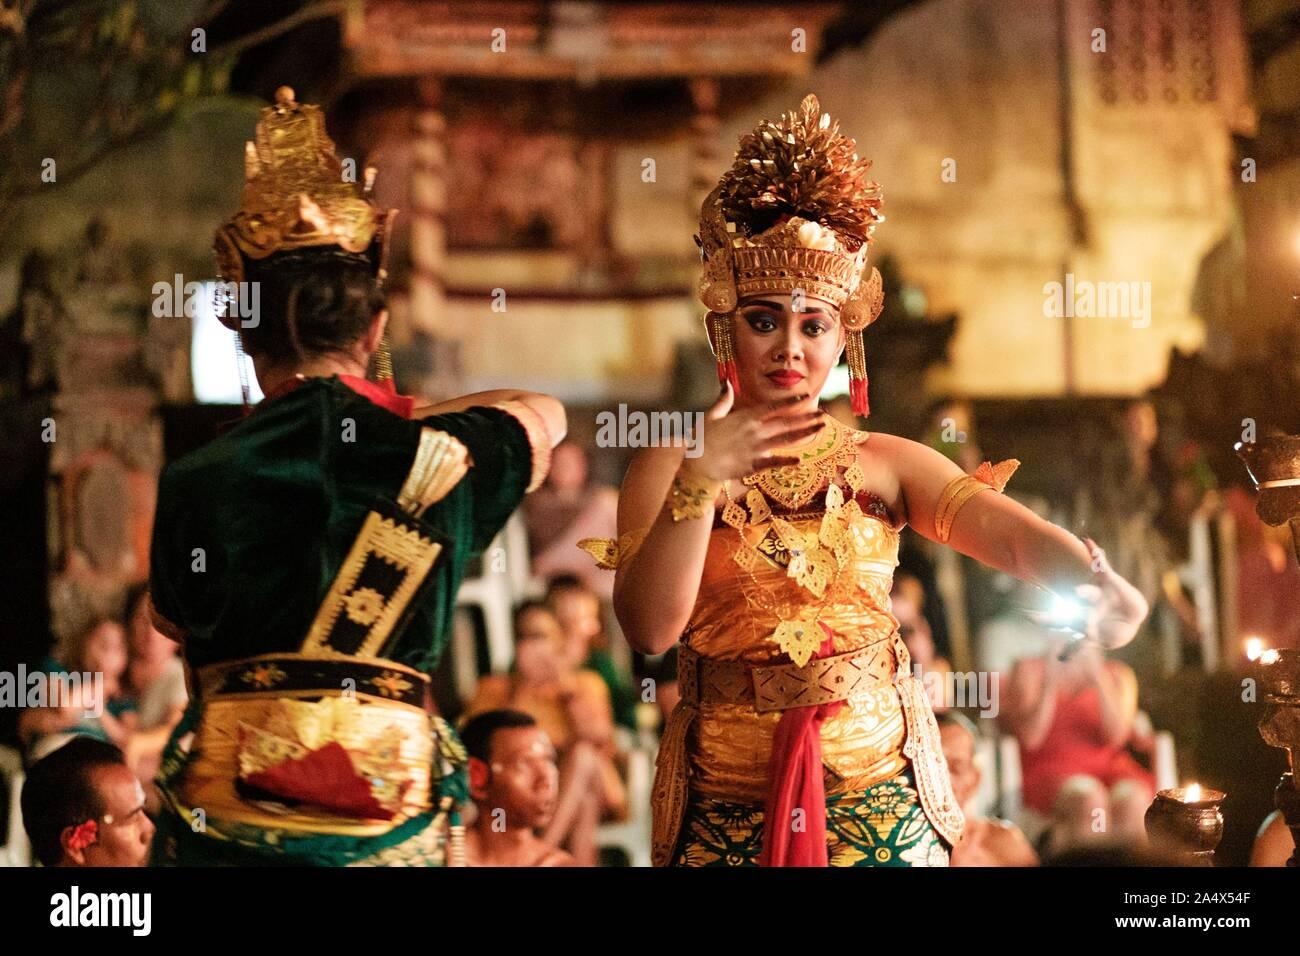 Kecak danza tradicional balinesa en traje Foto de stock